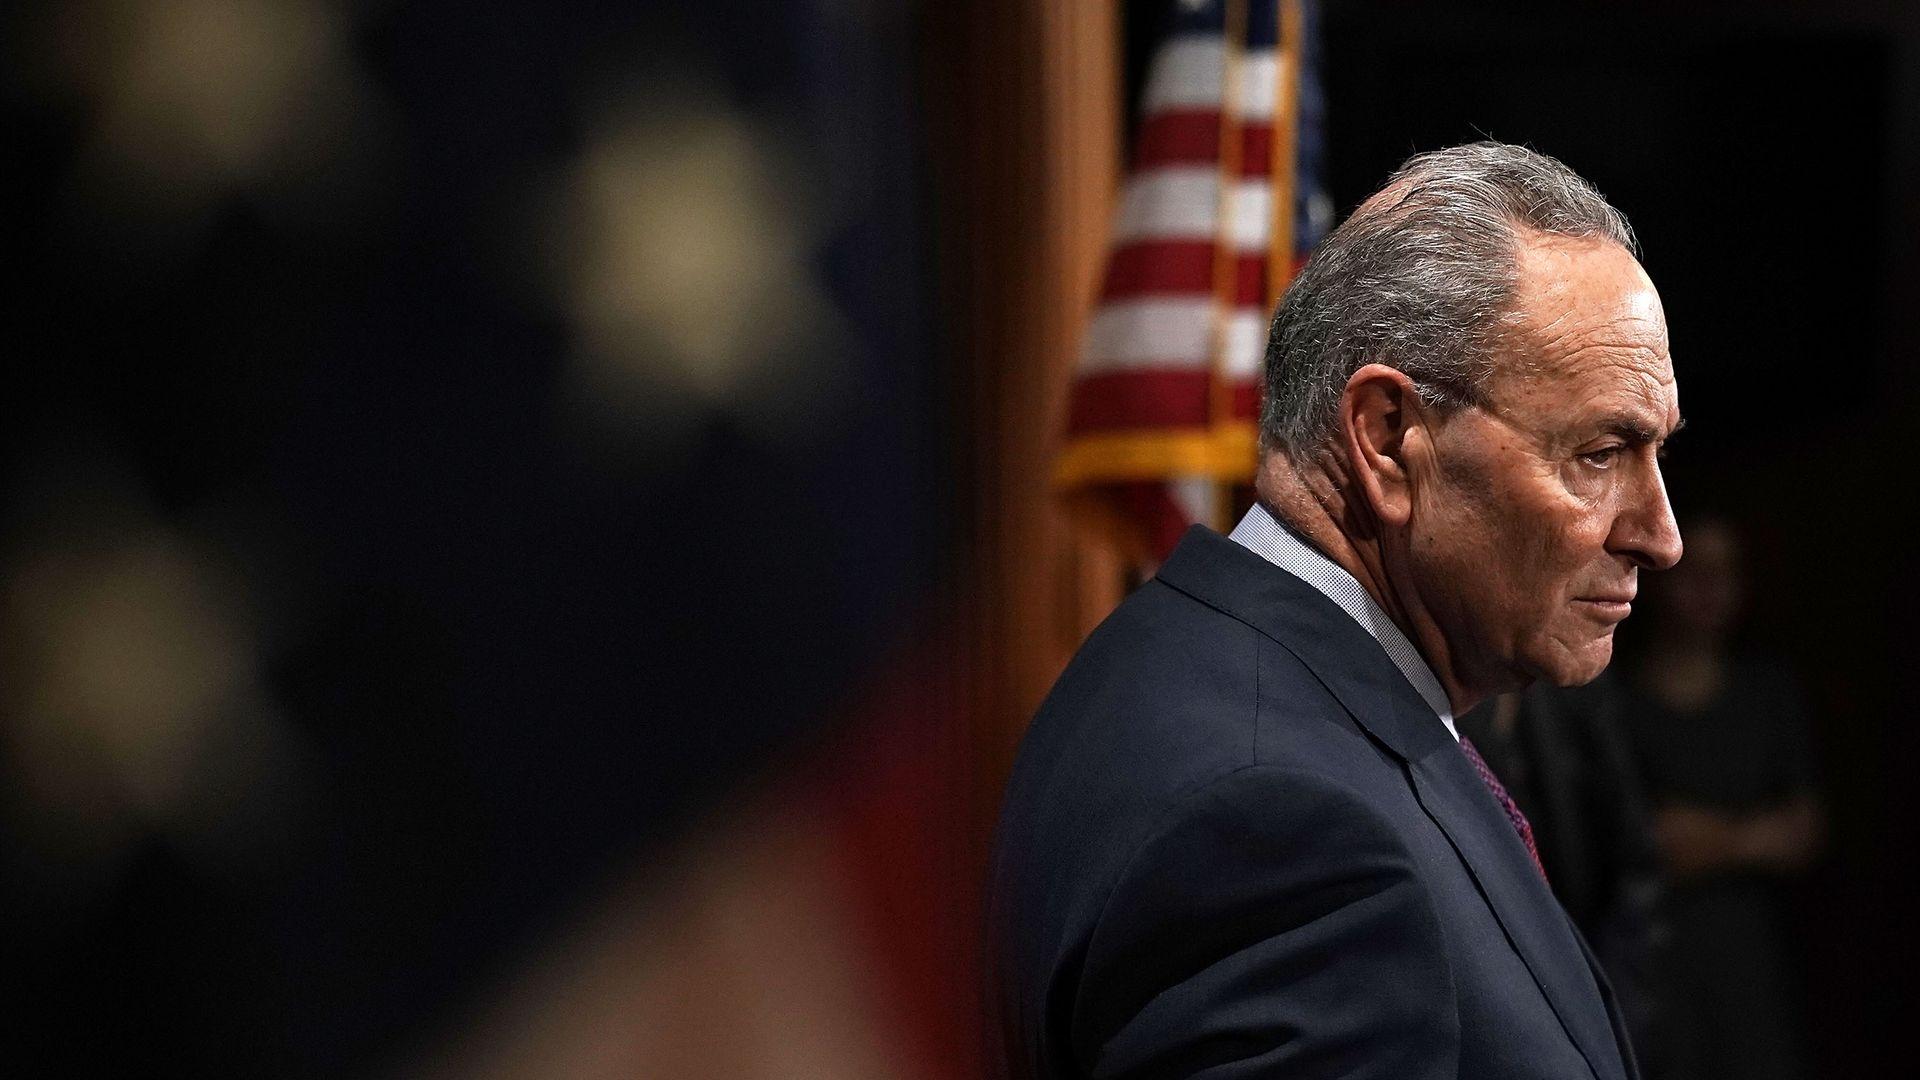 Senate Minority Leader Chuck Schumer listens at a press conference